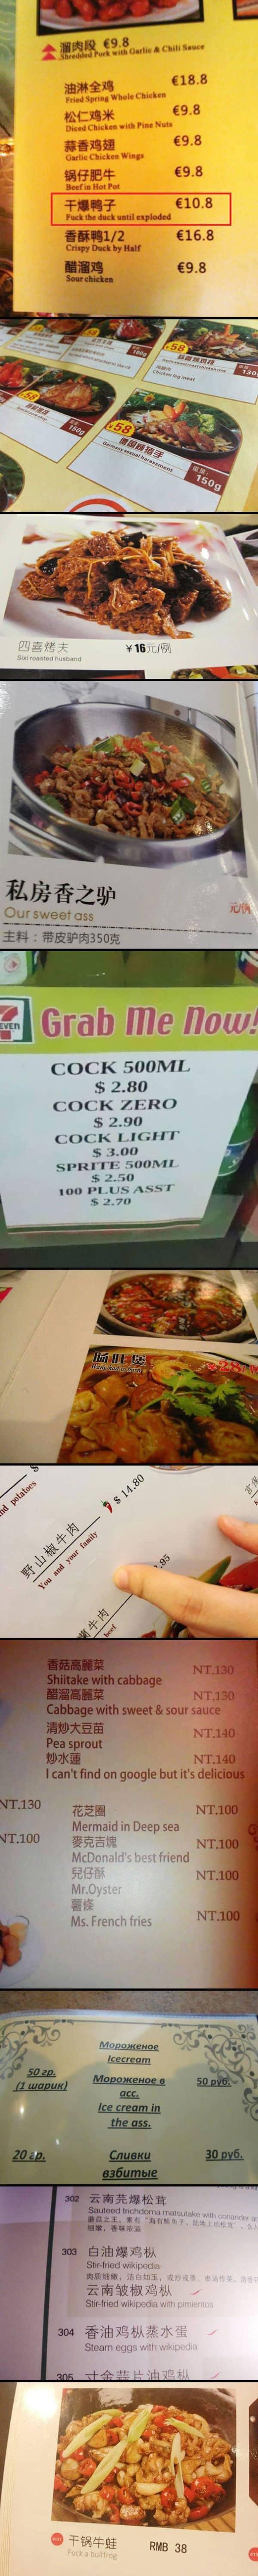 Something unfortunate translations of menus